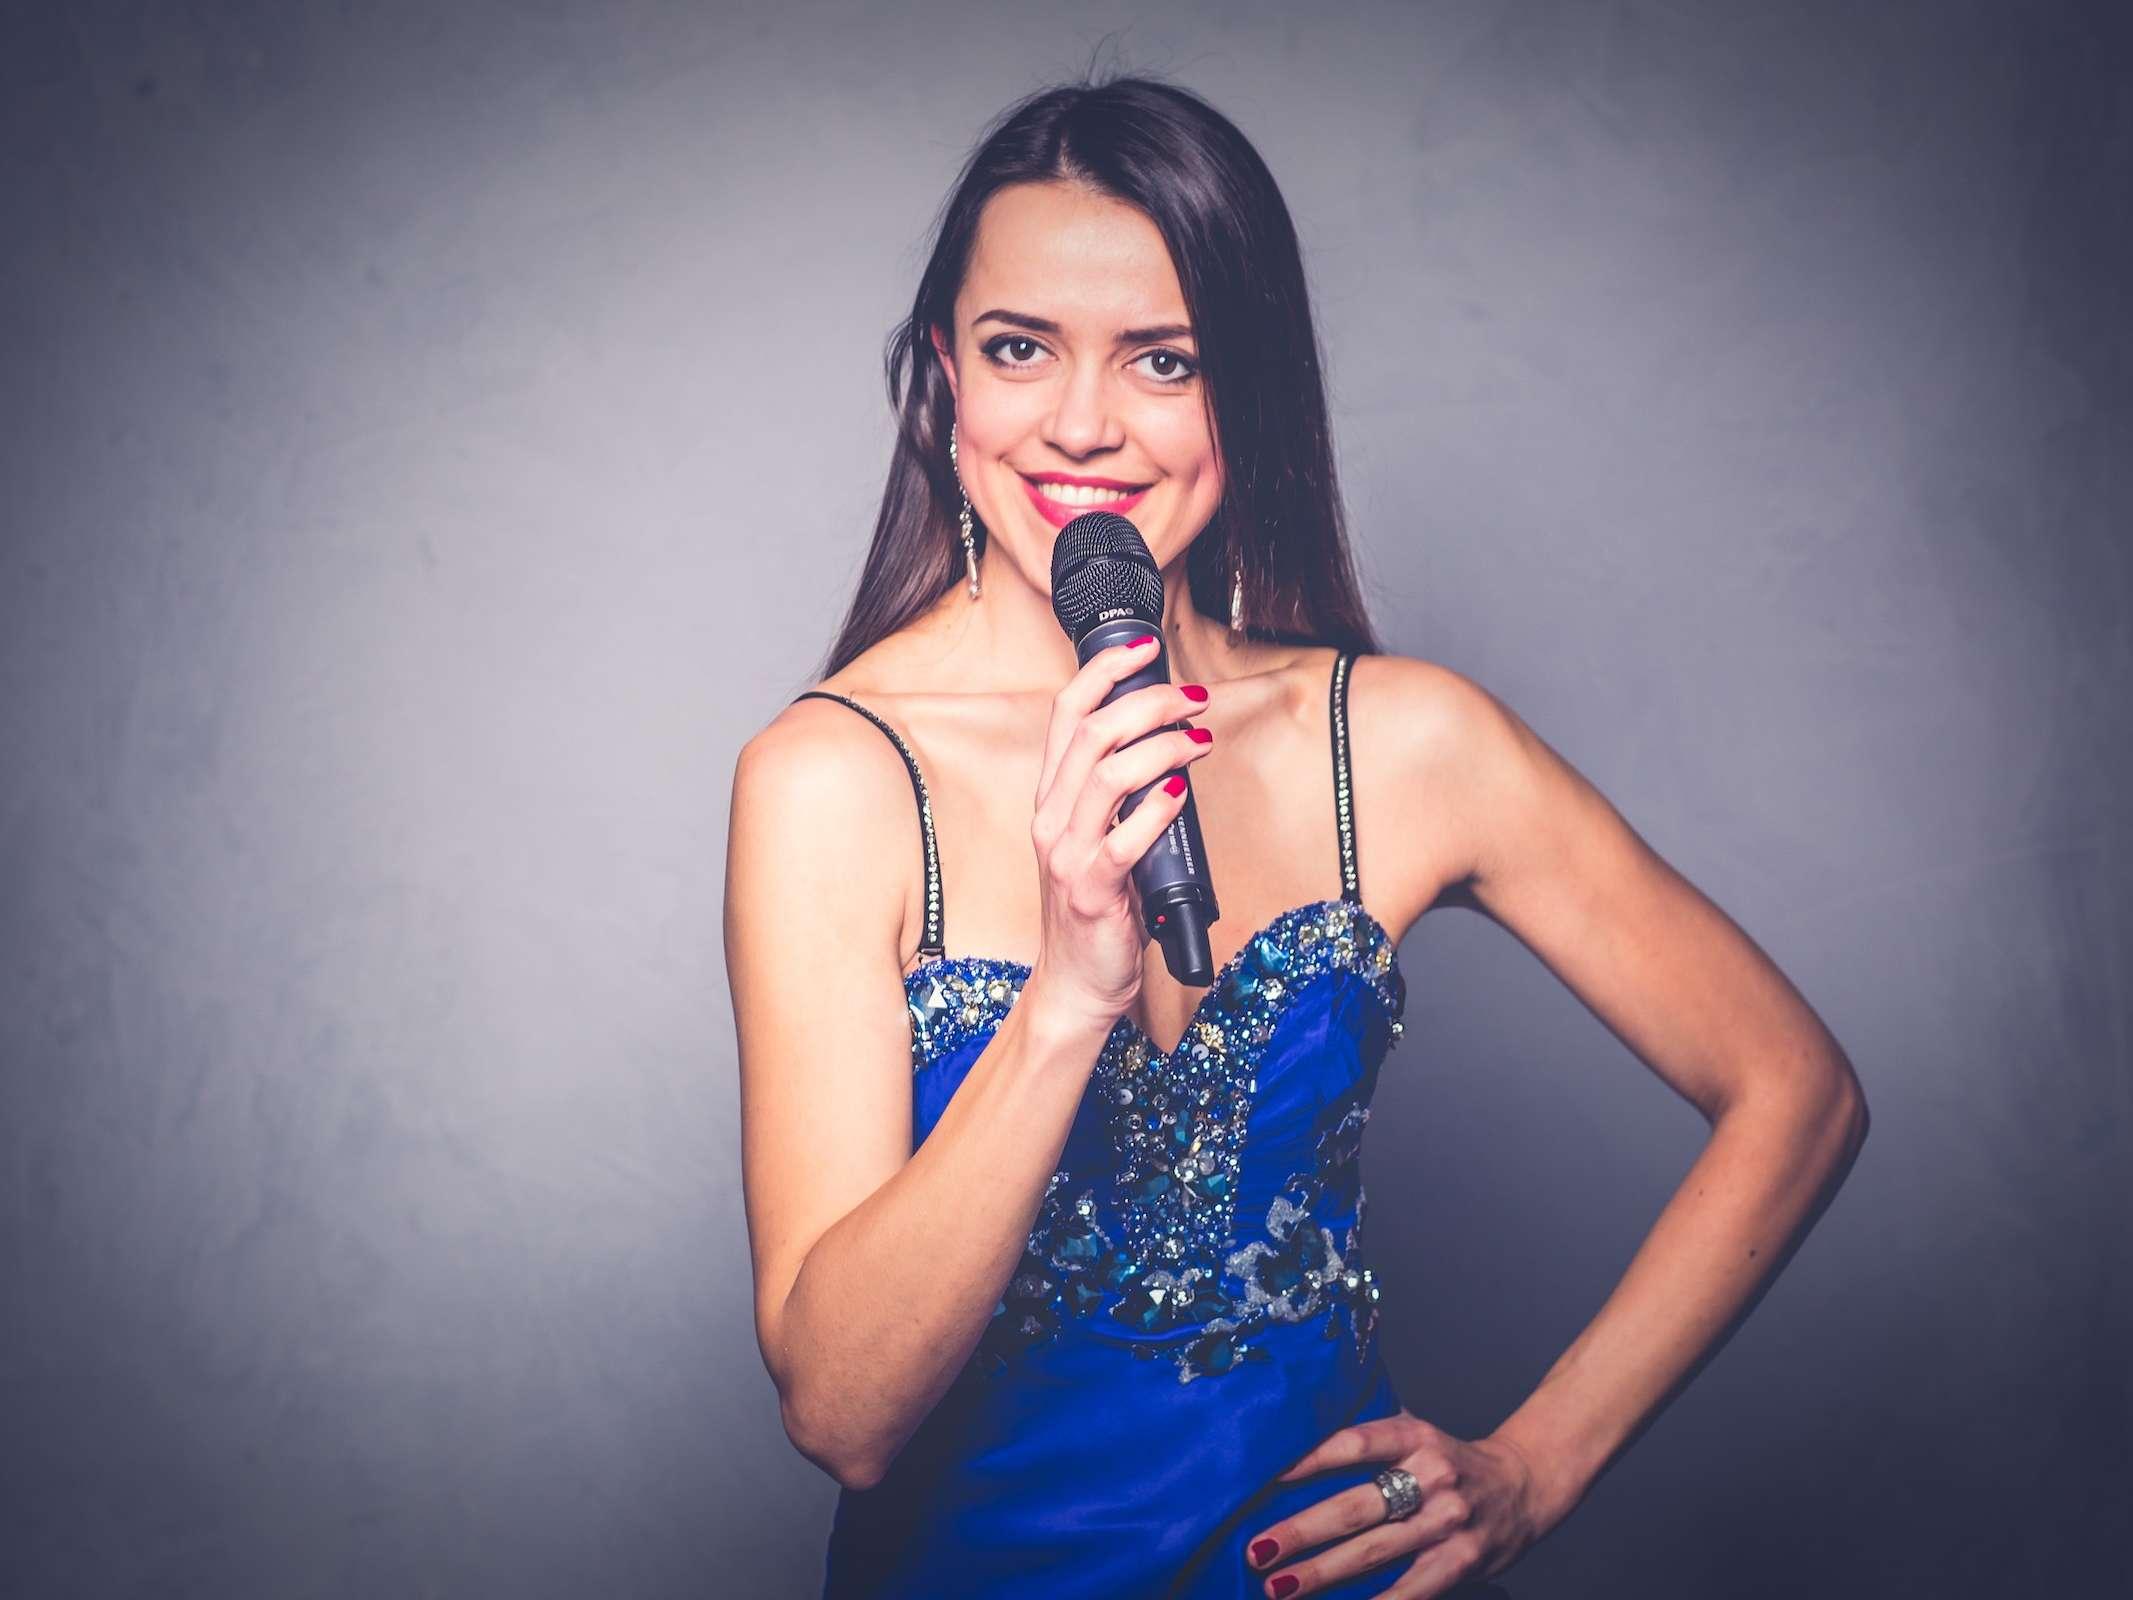 Band | Hannover | Liveband | Partyband | Jazzband | Swingband | Lounge | Popband | Jazz | Oxana | Sängerin | Hochzeitssängerin | Hochzeit | Messe | Firmenfeier | Charity |Gala | Buchen | Mieten | Anfragen